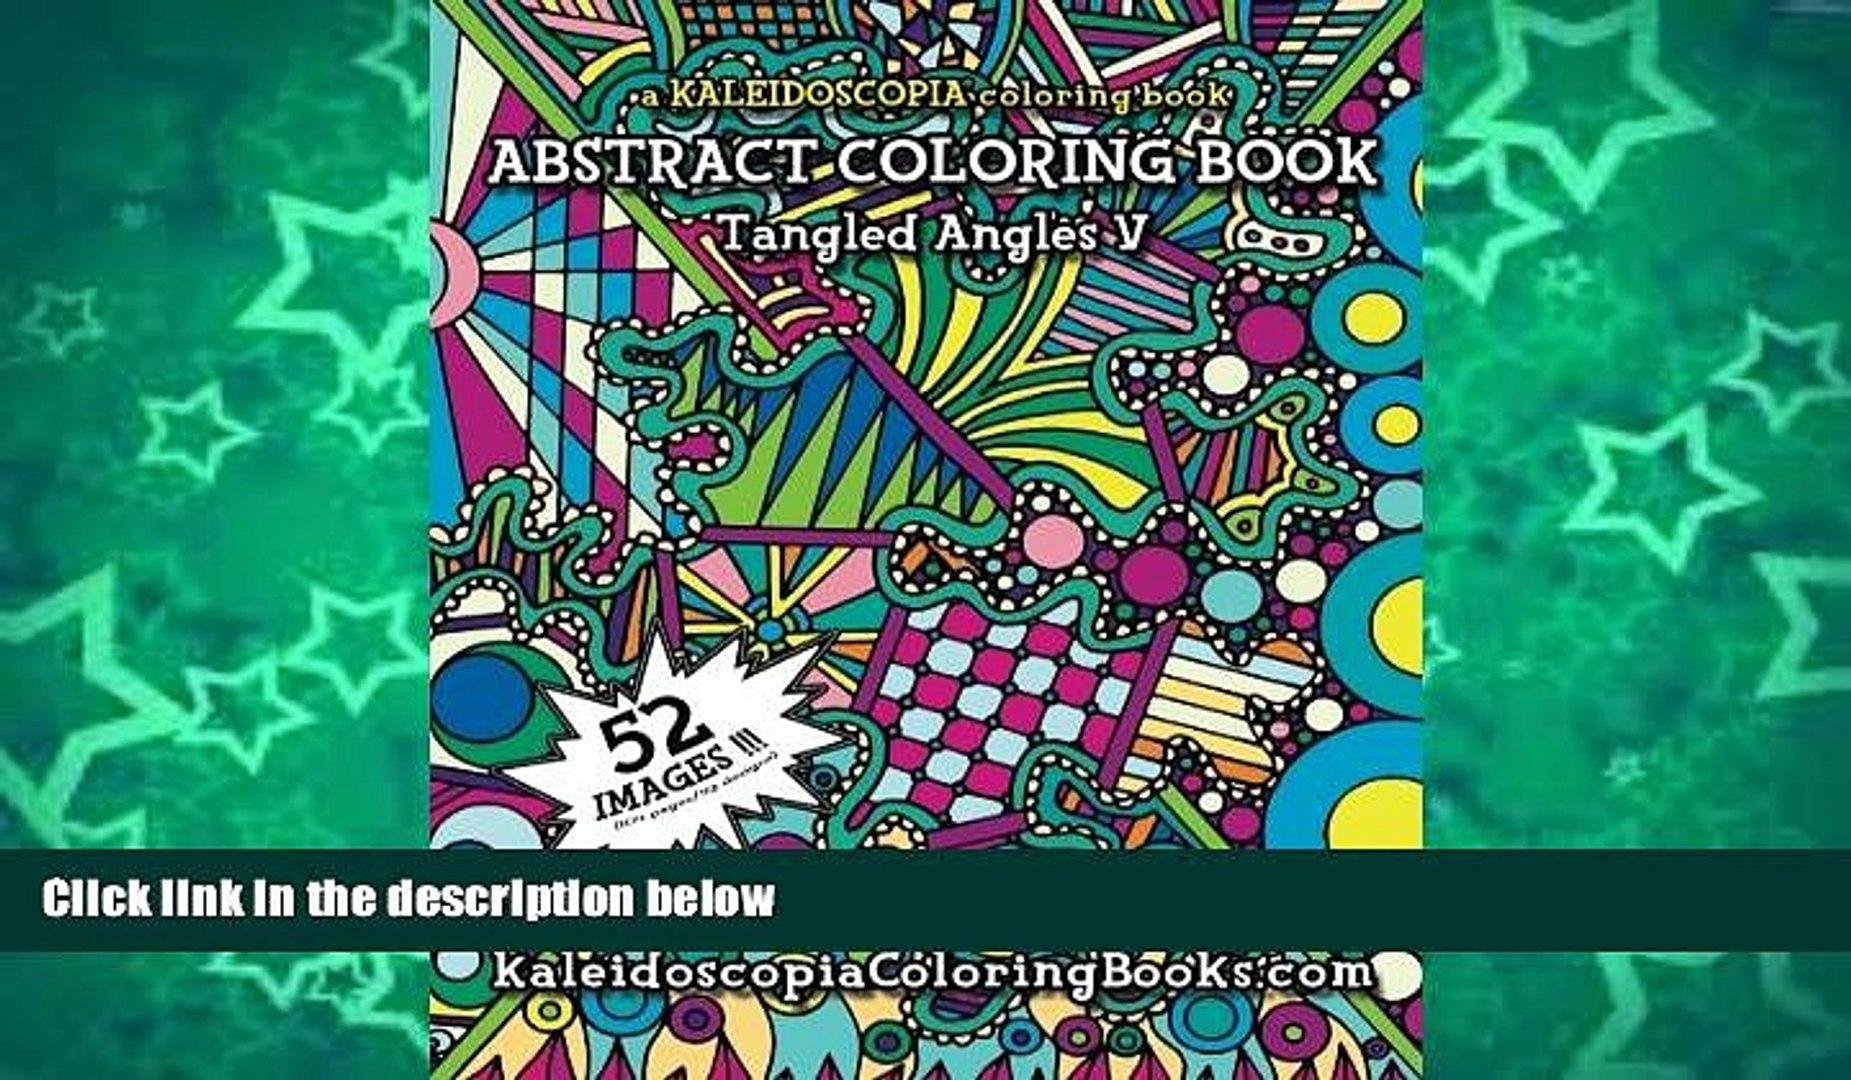 Pre Order Tangled Angles 5: A Kaleidoscopia Coloring Book: An Abstract  Coloring Book (Volume 5)